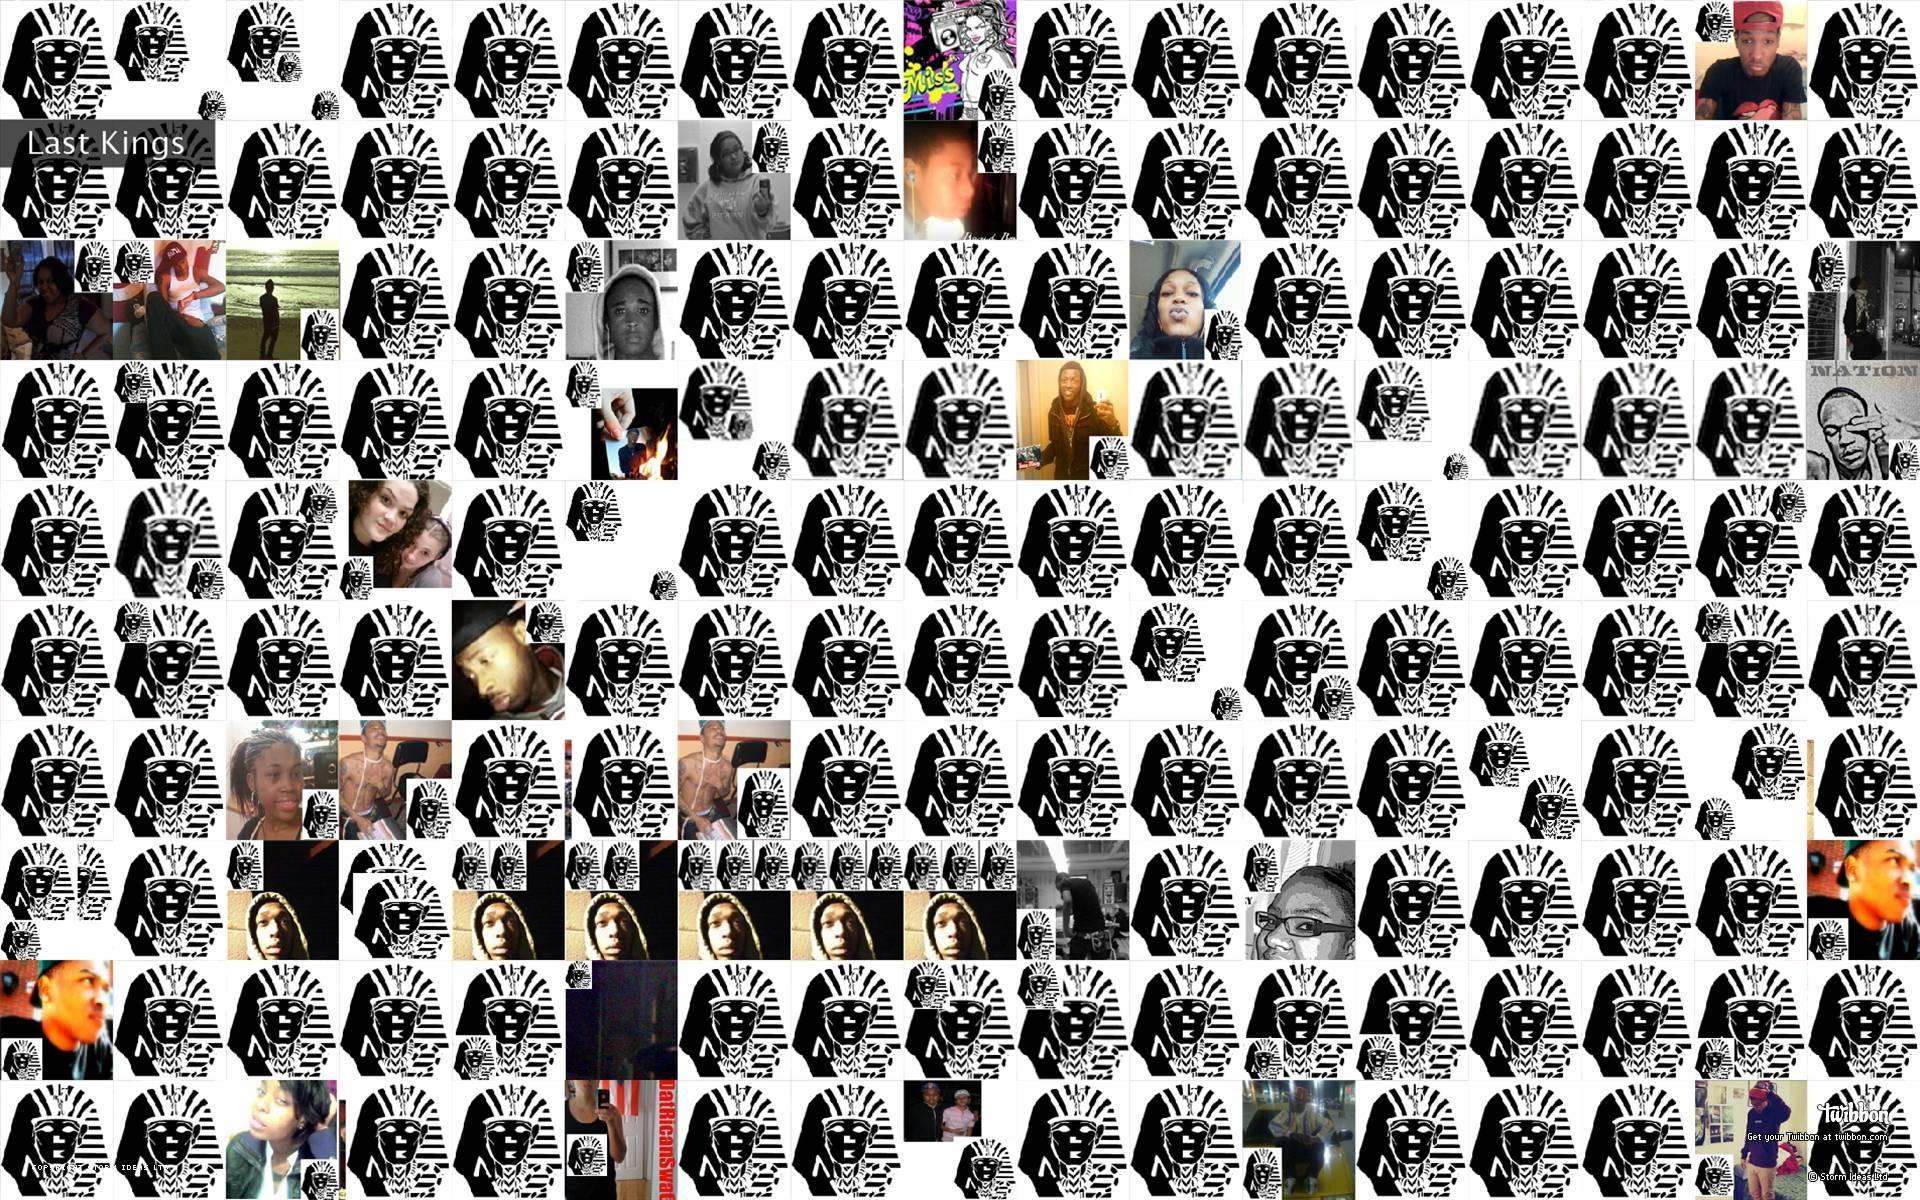 Tyga Quotes And Wallpaper Downloads Tyga Last Kings Wallpaper Hd 183 ①